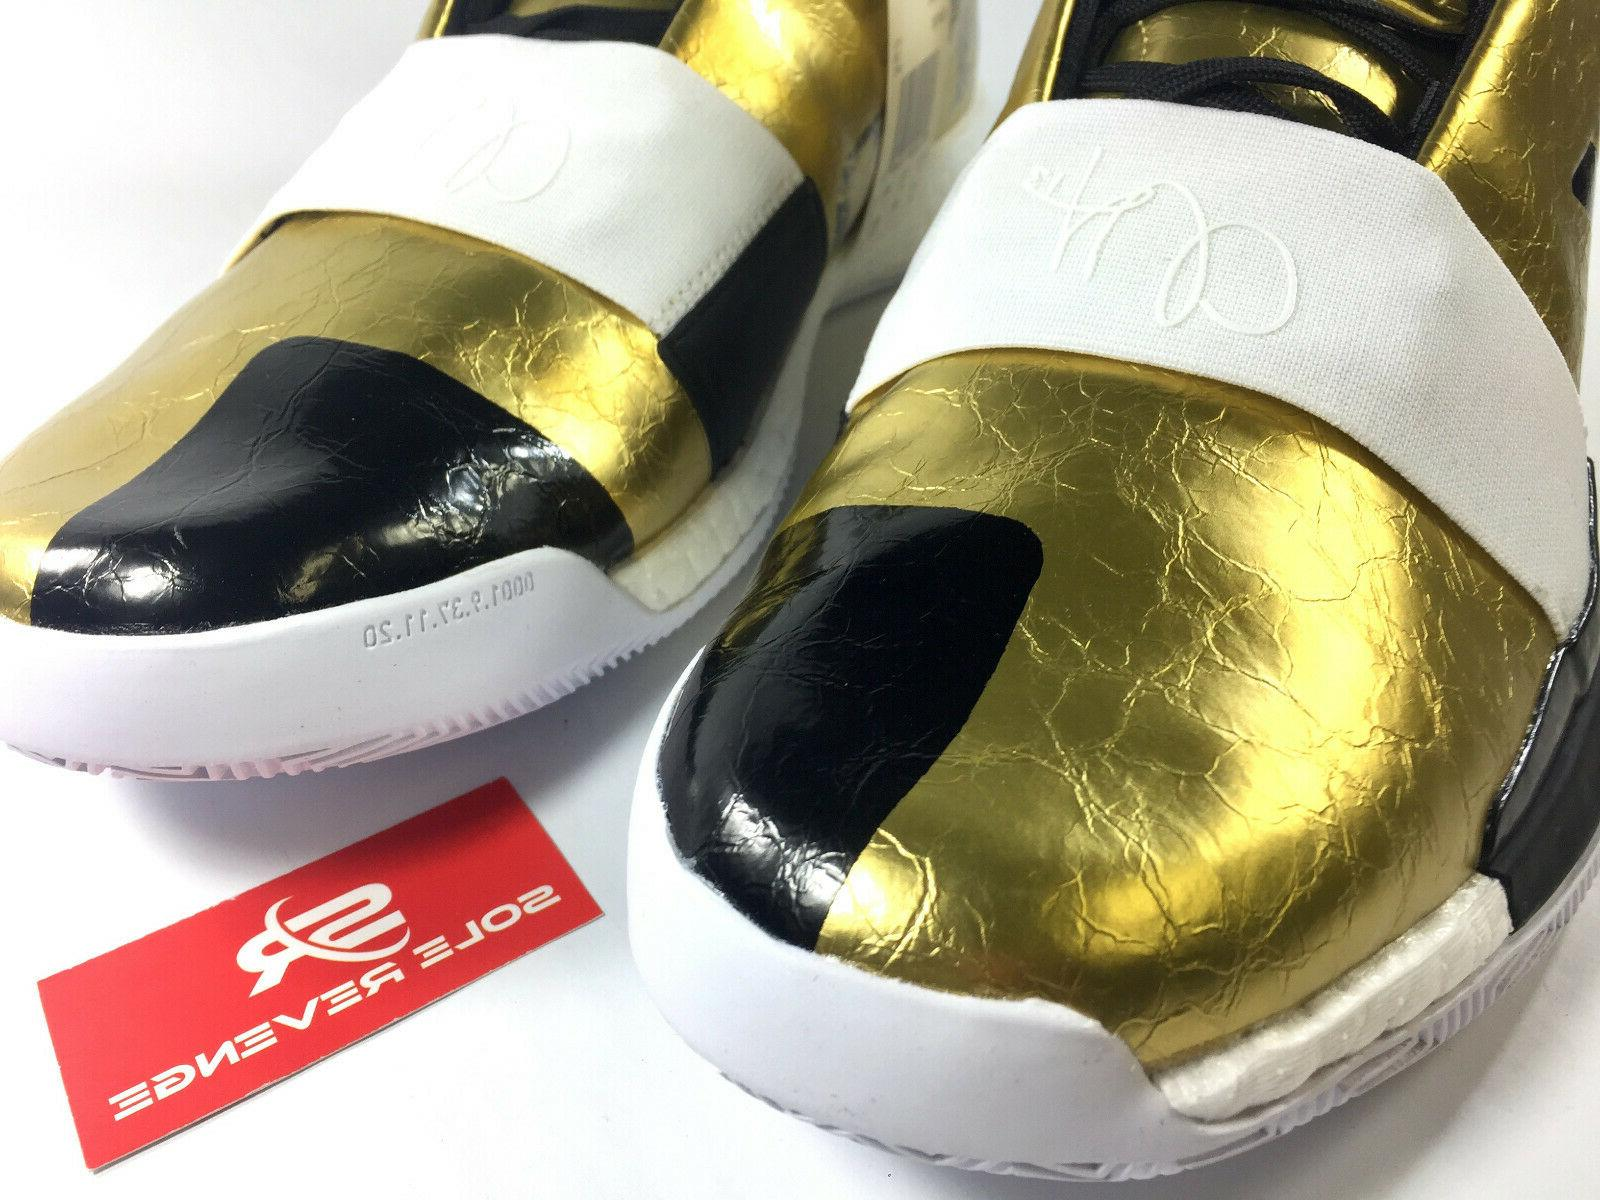 New adidas VOL. 'IMMA G54026 Black c1